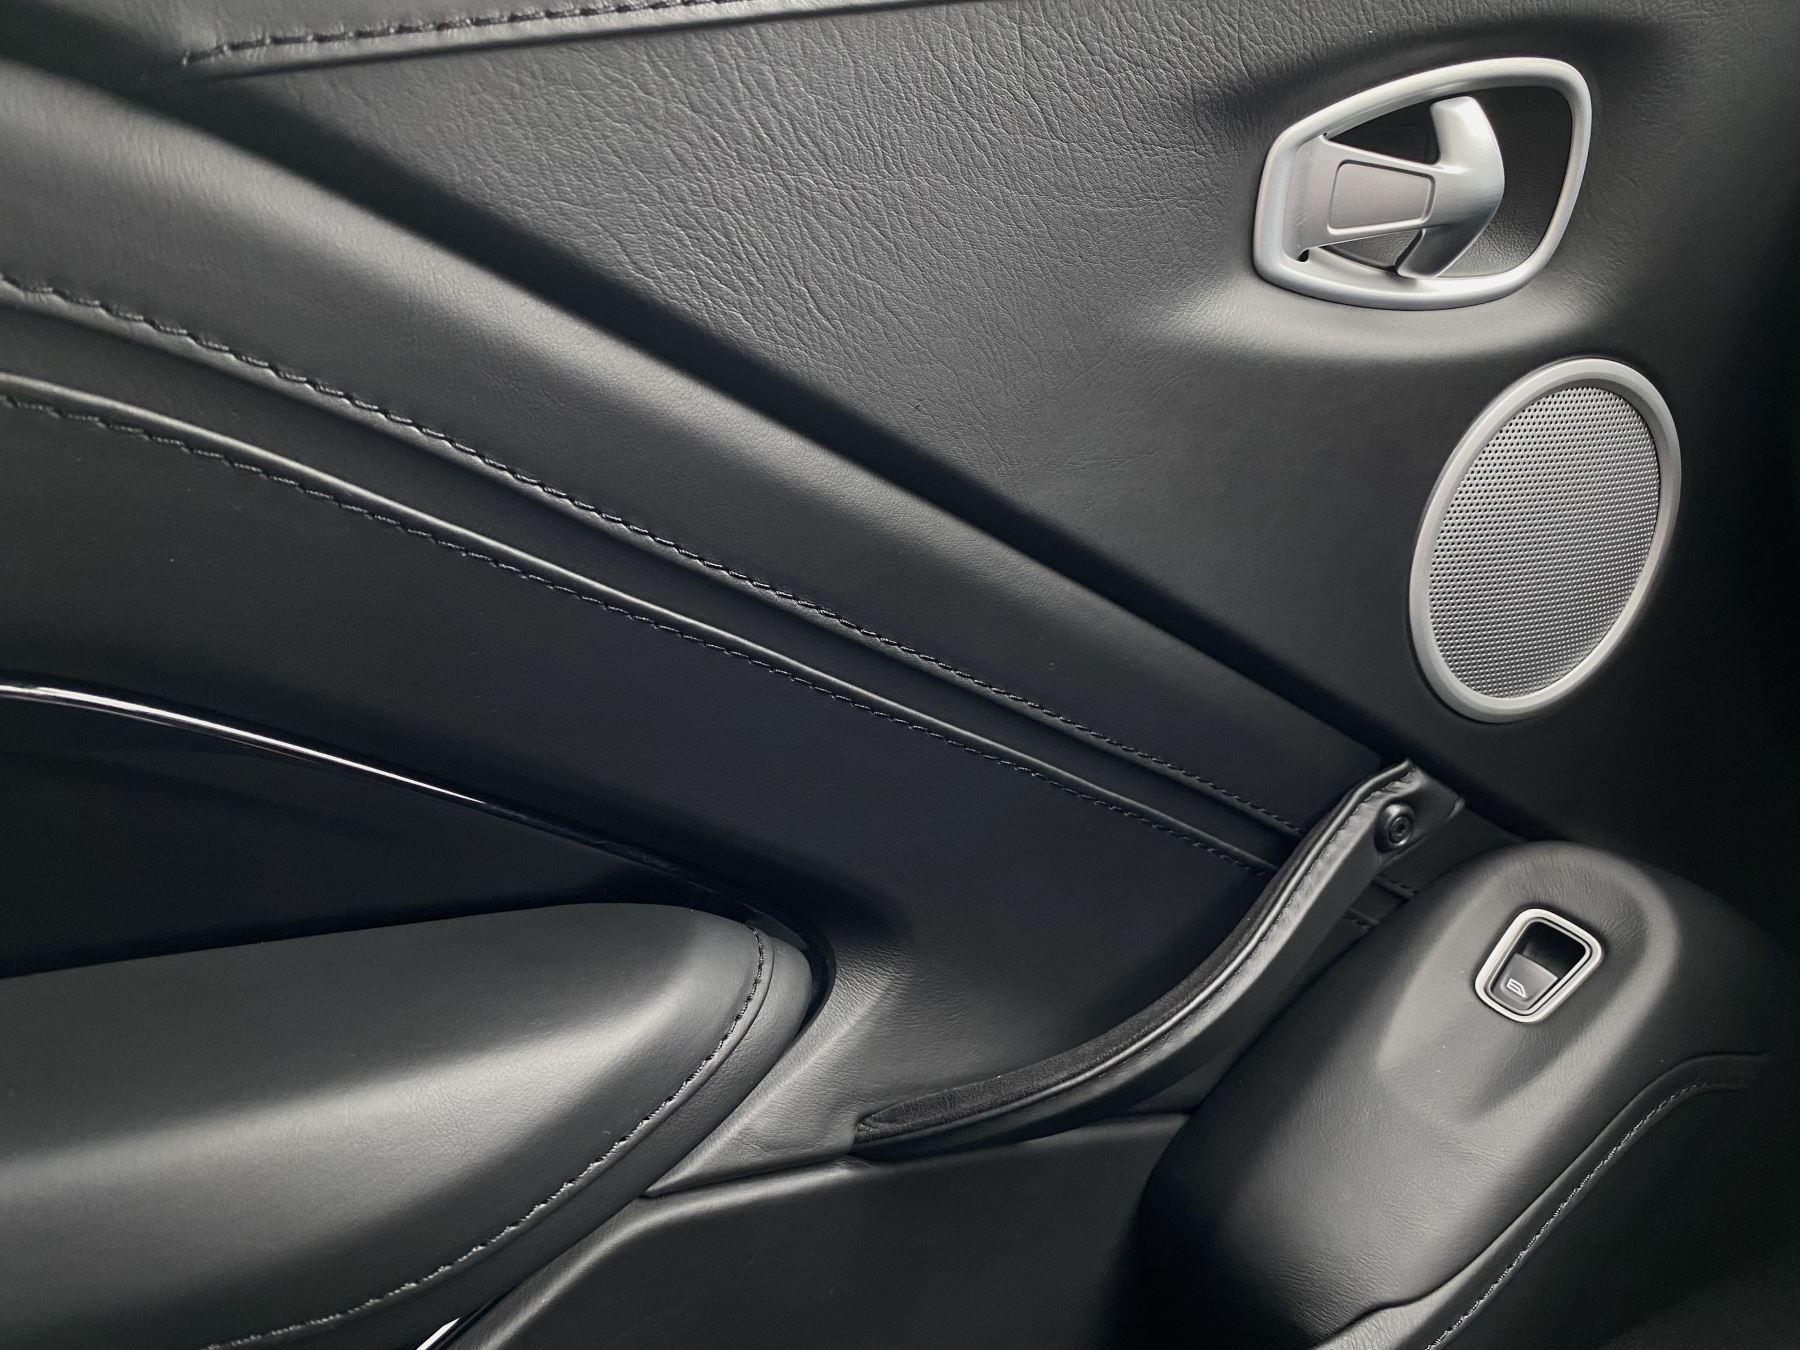 Aston Martin New Vantage 2dr ZF 8 Speed Auto. 4.0 Twin Turbo ZF Gearbox  Reversing Camera Heated Seats Ceramic Brakes image 35